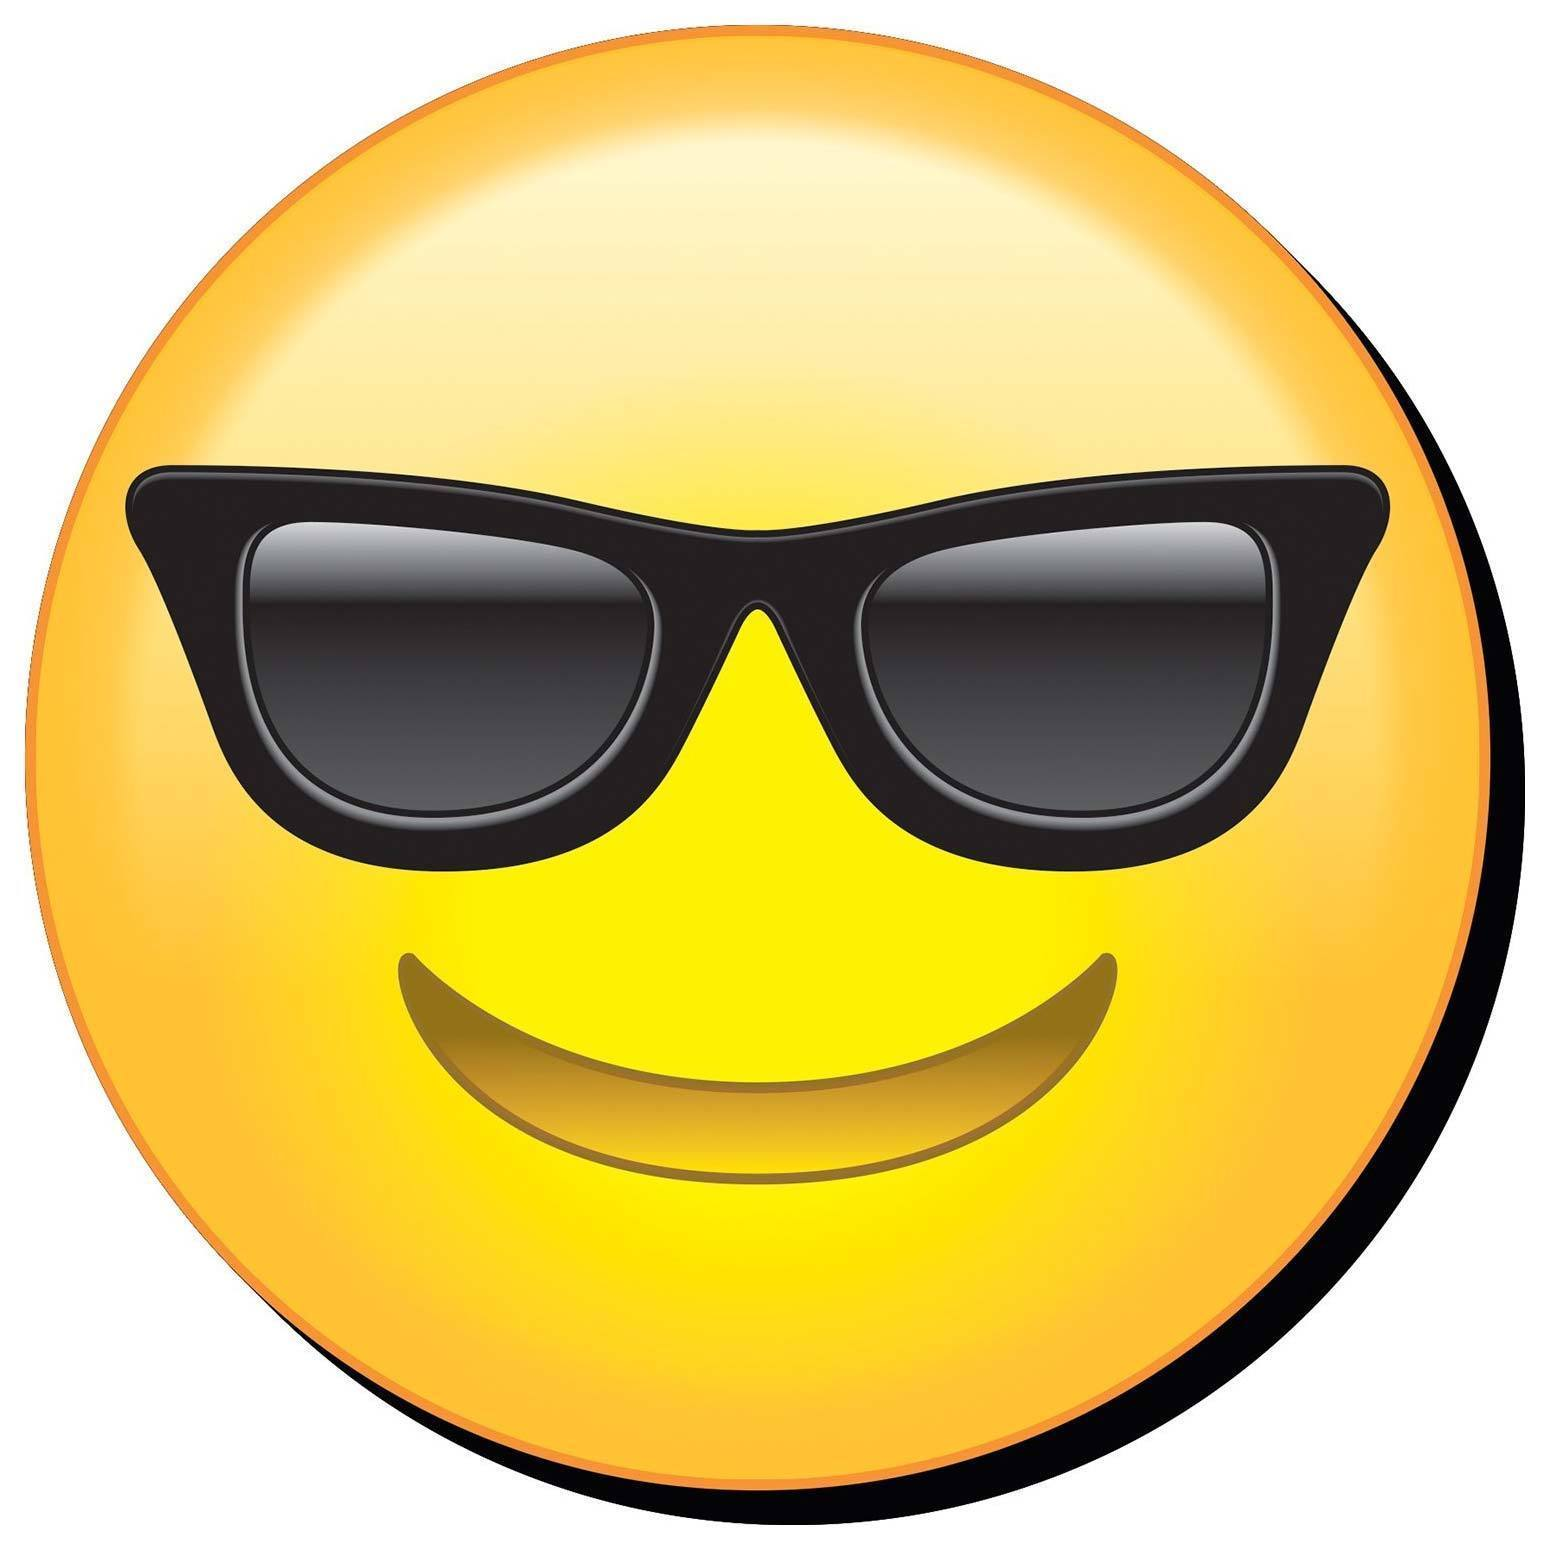 Cool Sunglasses Emoji Magnet Yellow - Magnets